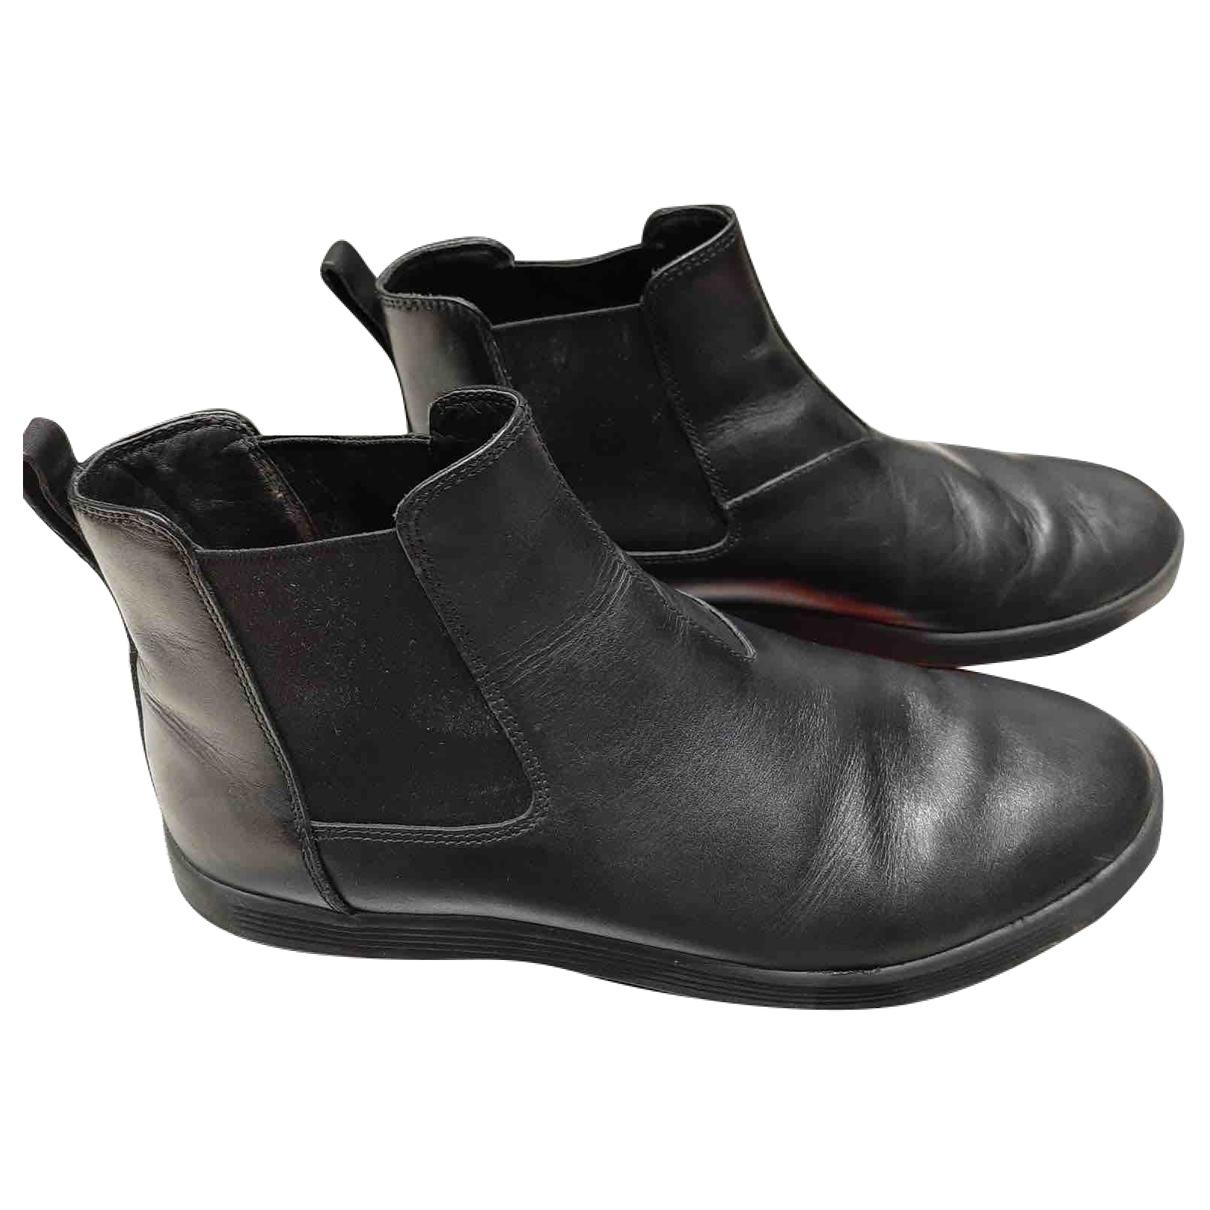 Botas de Cuero Prada